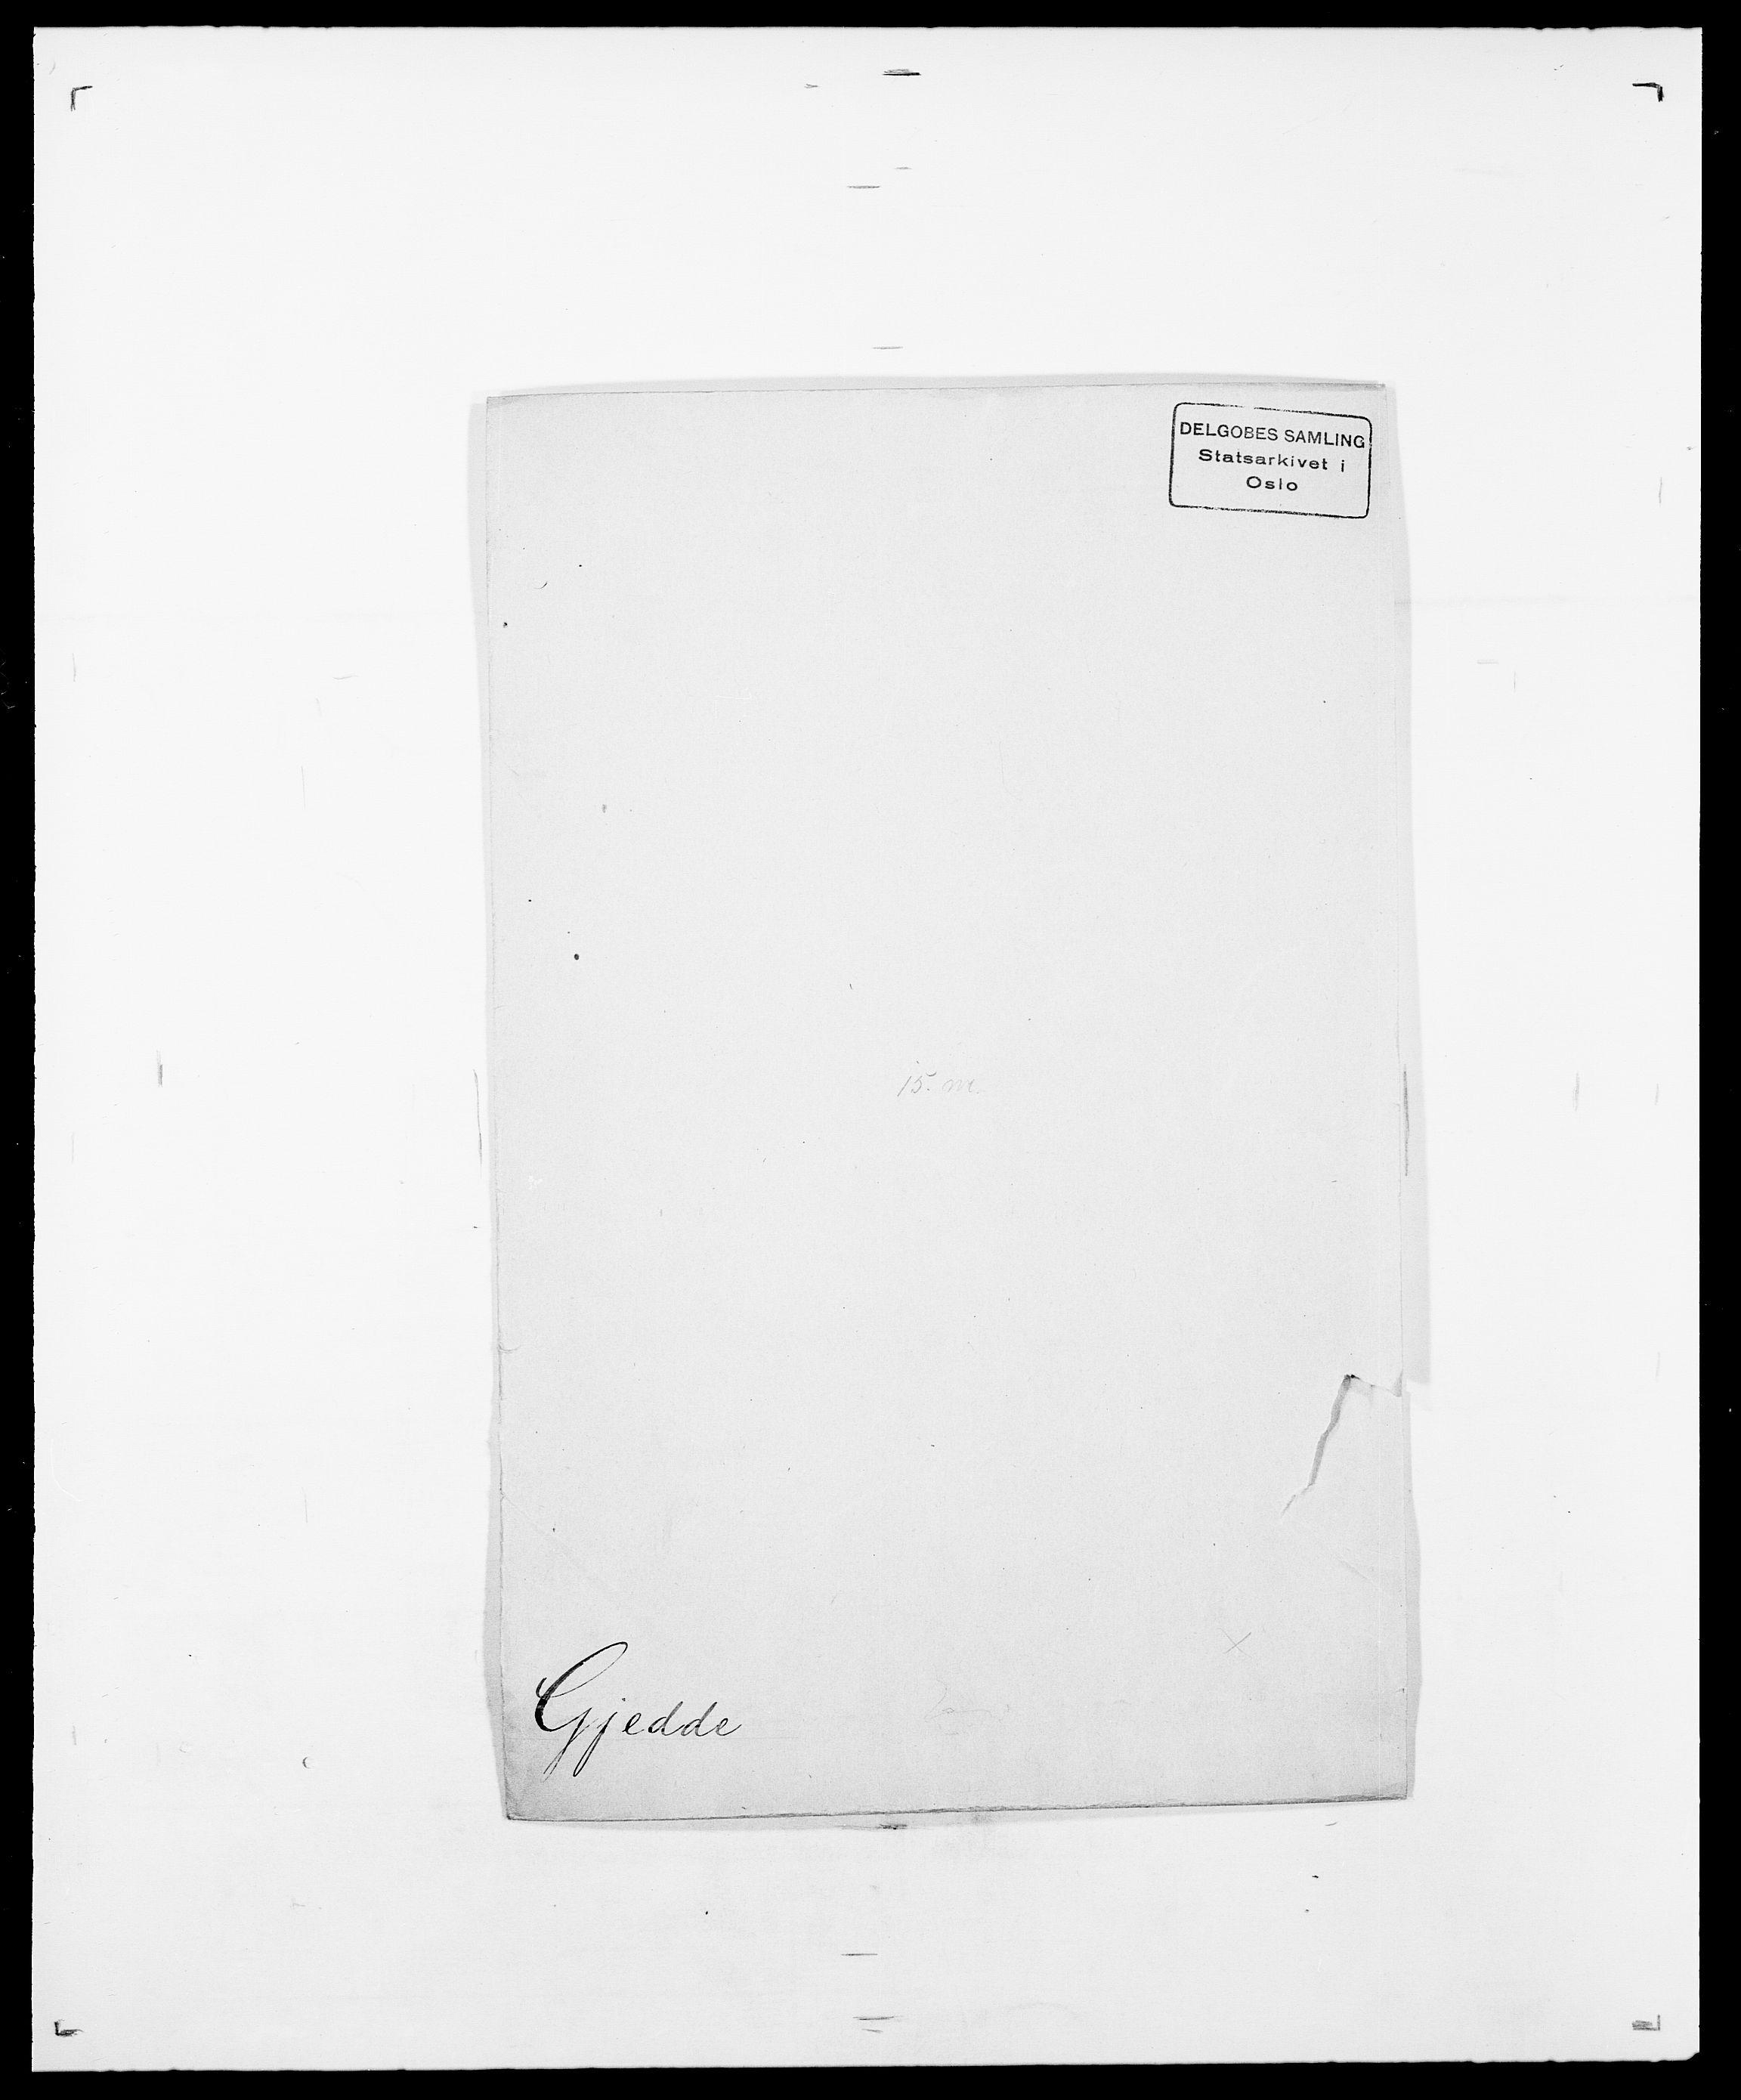 SAO, Delgobe, Charles Antoine - samling, D/Da/L0014: Giebdhausen - Grip, s. 68